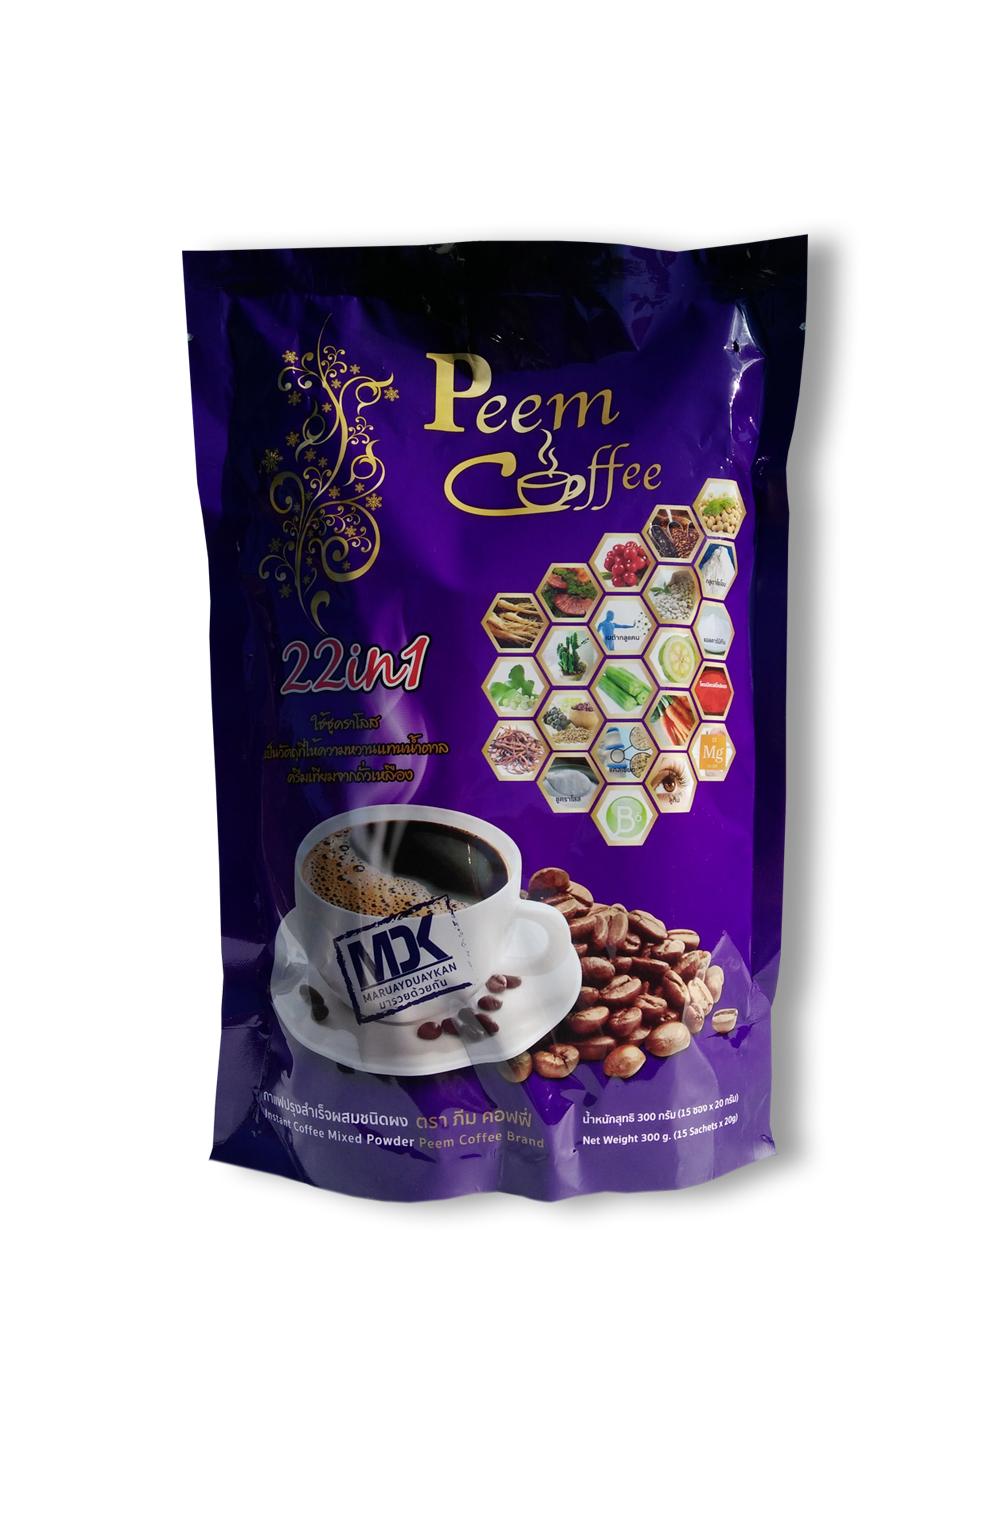 Peem Coffee 22 in 1 (สำหรับออกรหัสทำธุรกิจสายงาน)